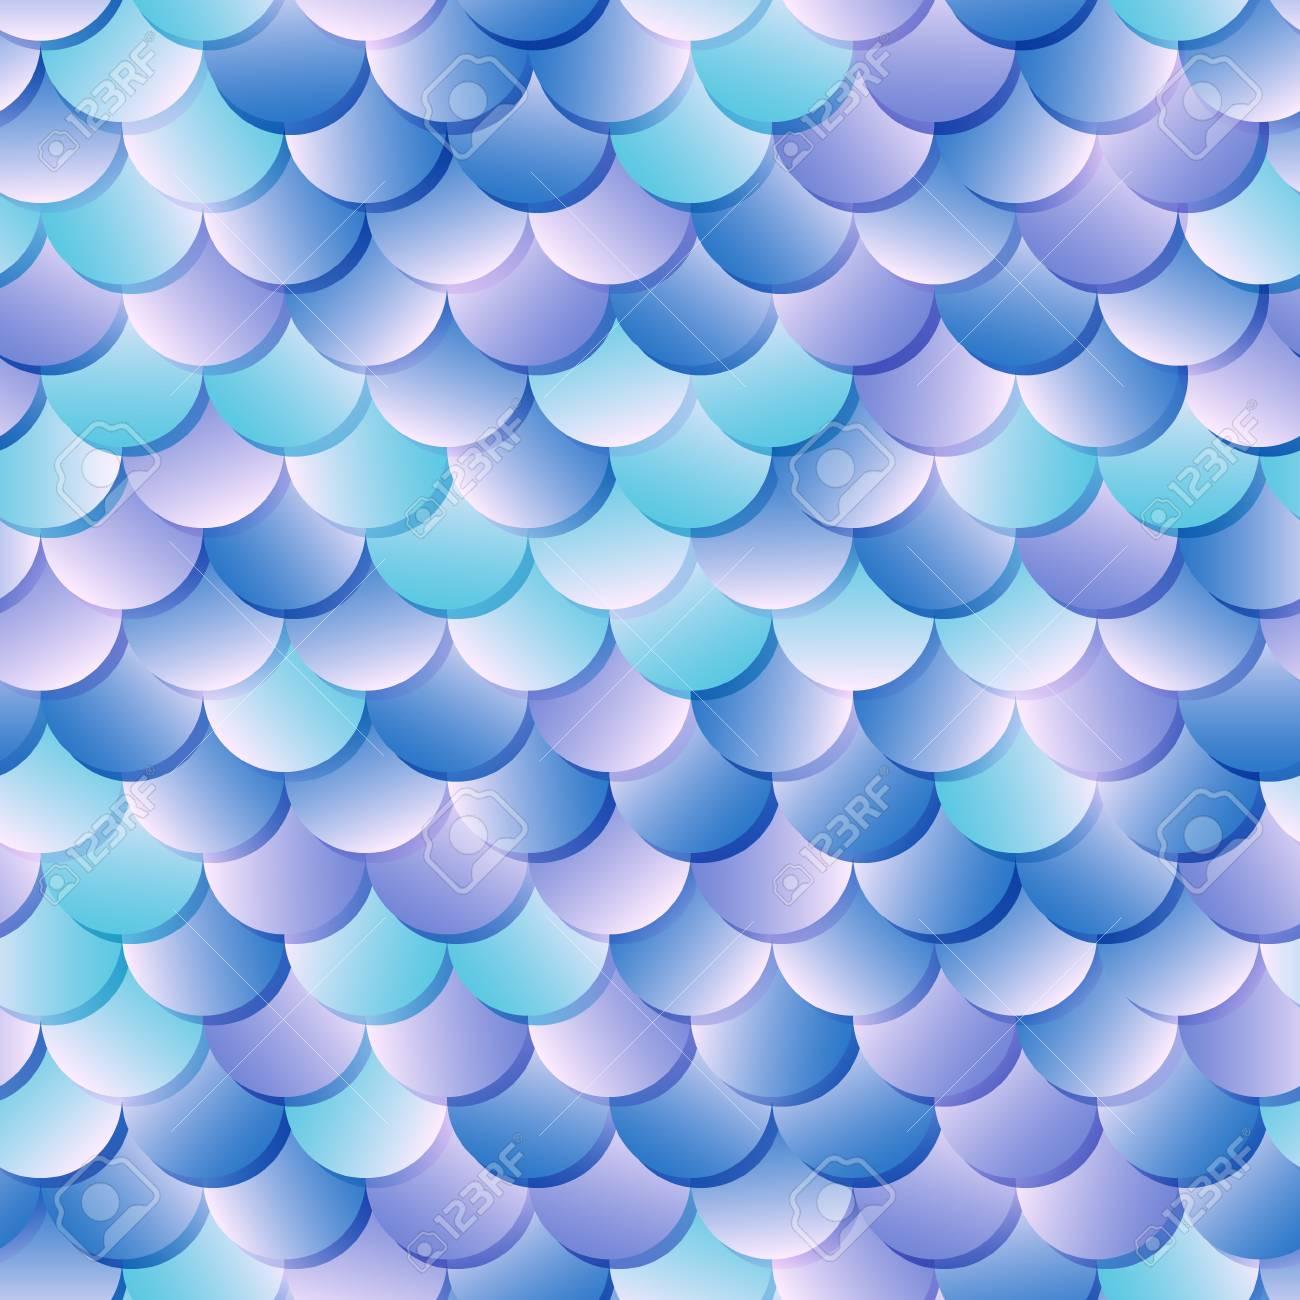 Free Download Mermaid Skin Seamless Pattern Fantastic Fish